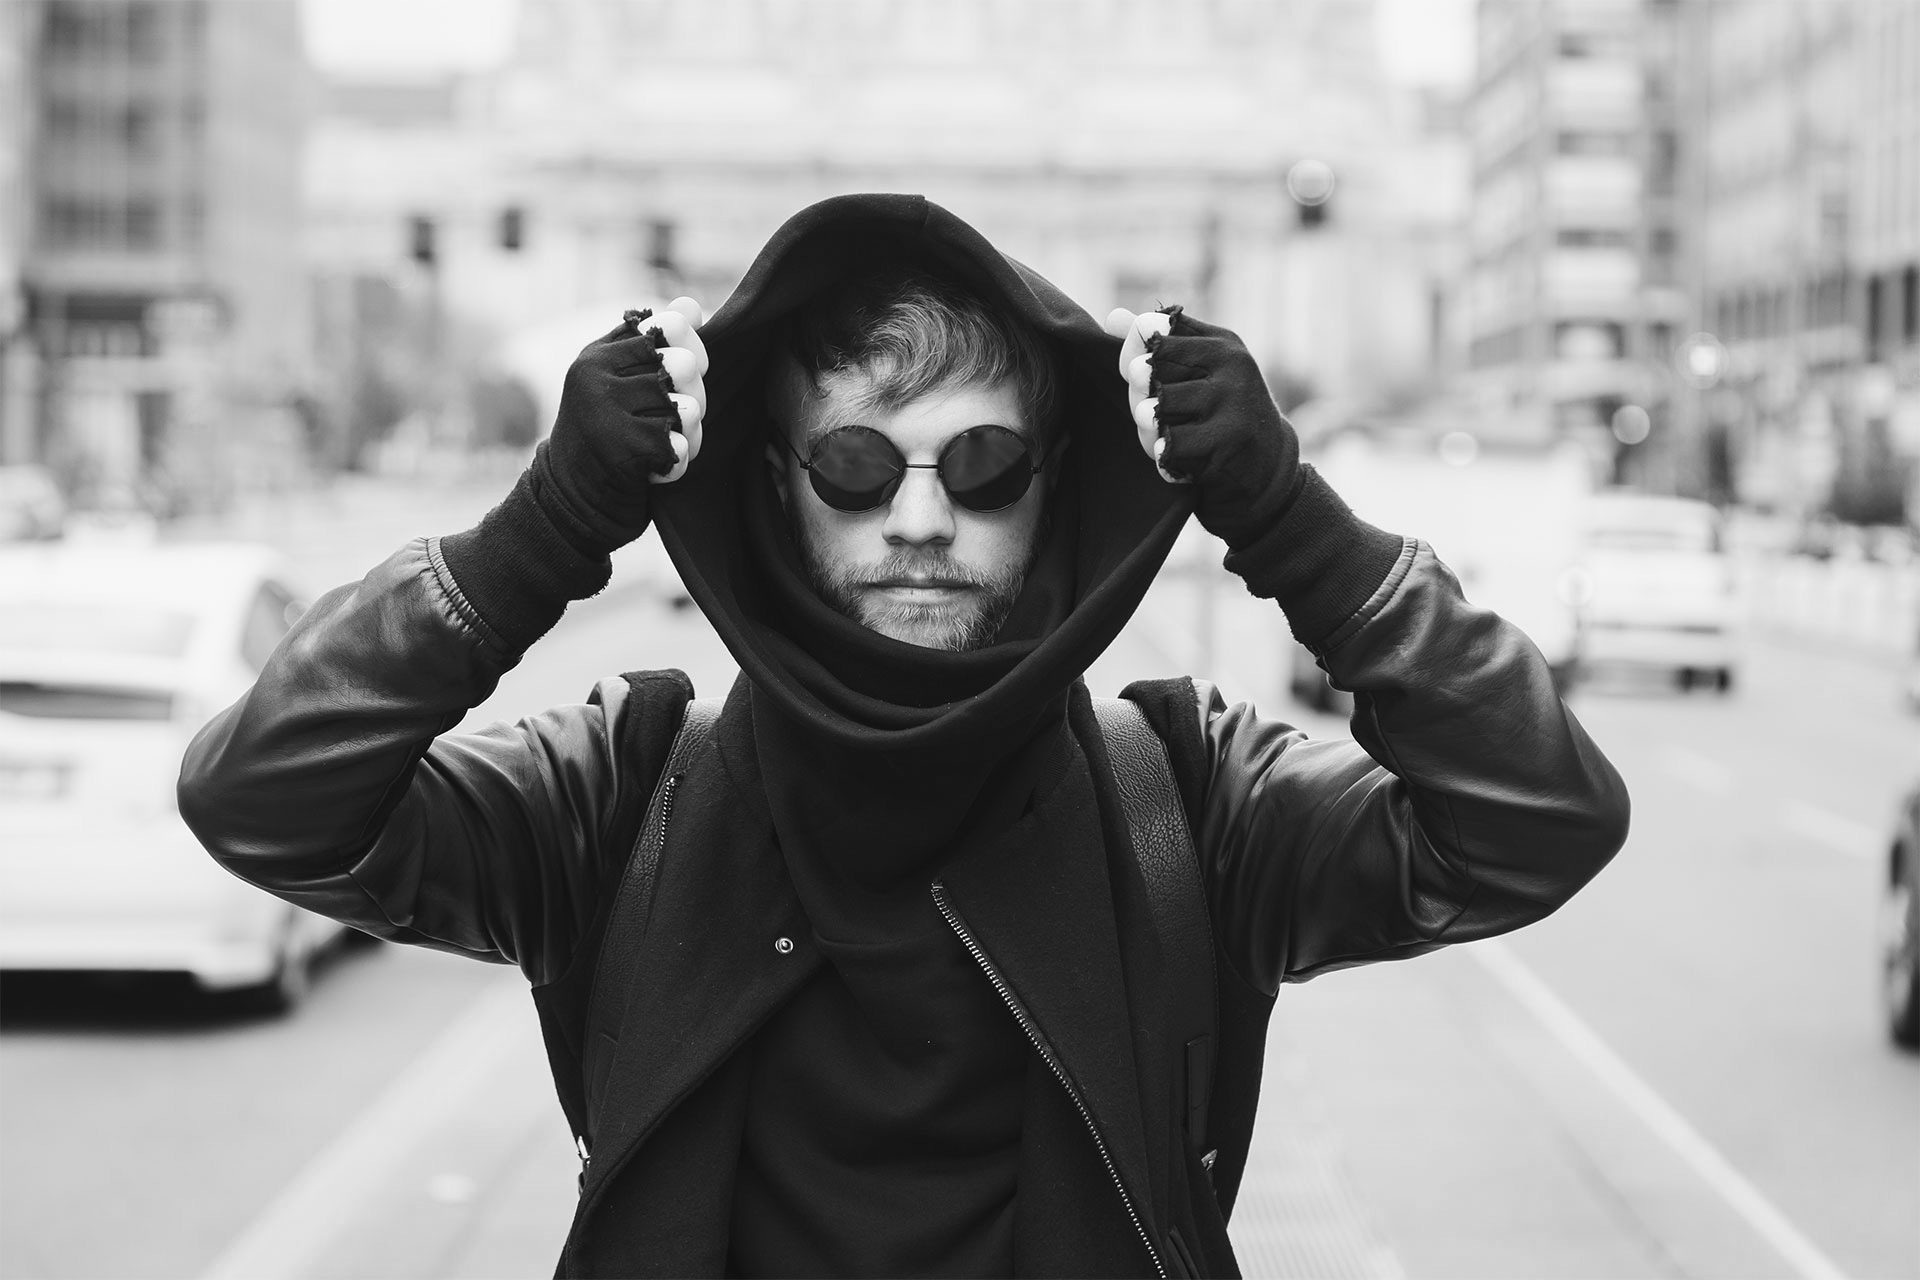 stylish-bearded-man-posing-in-the-street-P57BKWYs.jpg